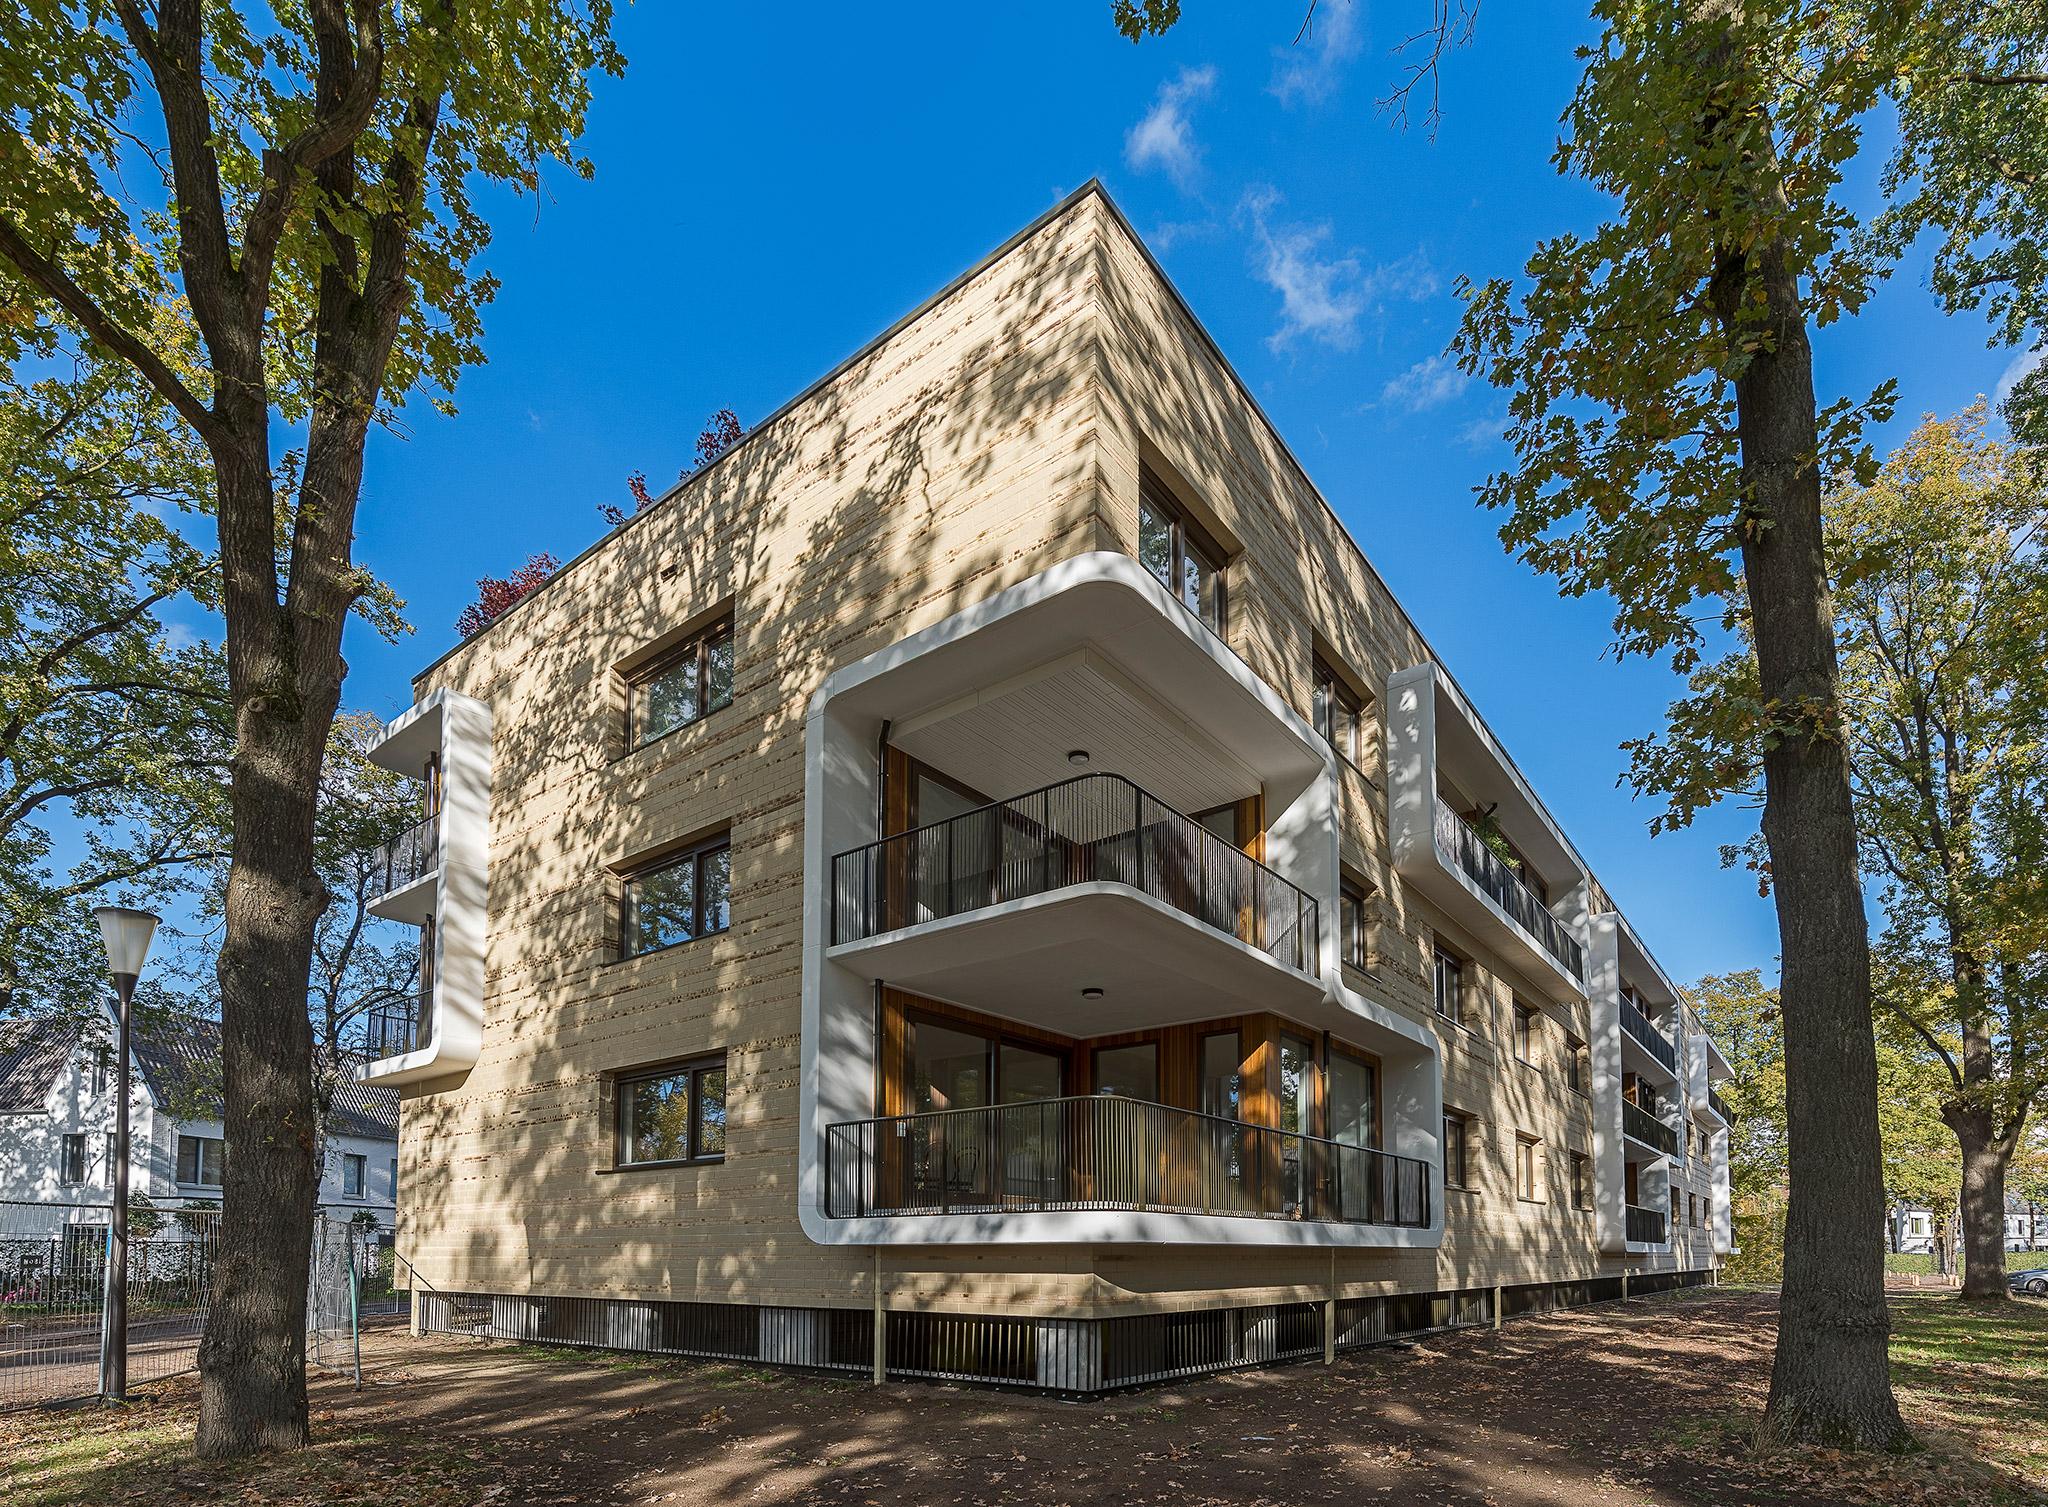 Simone-Drost-Architecture-Planet-Lab-Architecture-Appartementen-Stadhouderspark-Vught-zijgevel-met-balkons